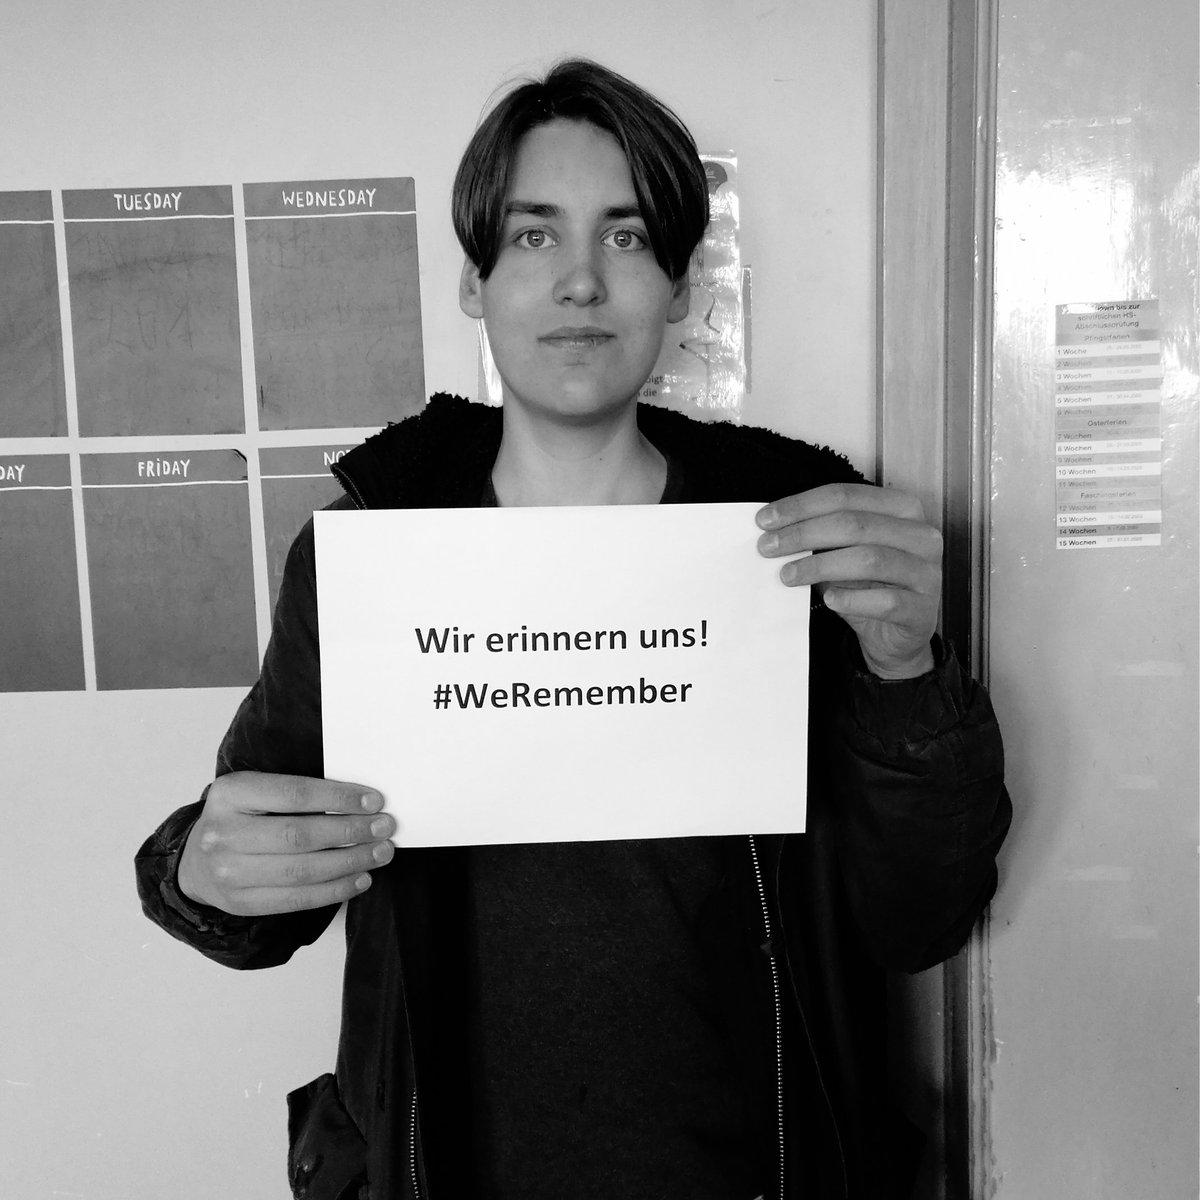 #WeRemember